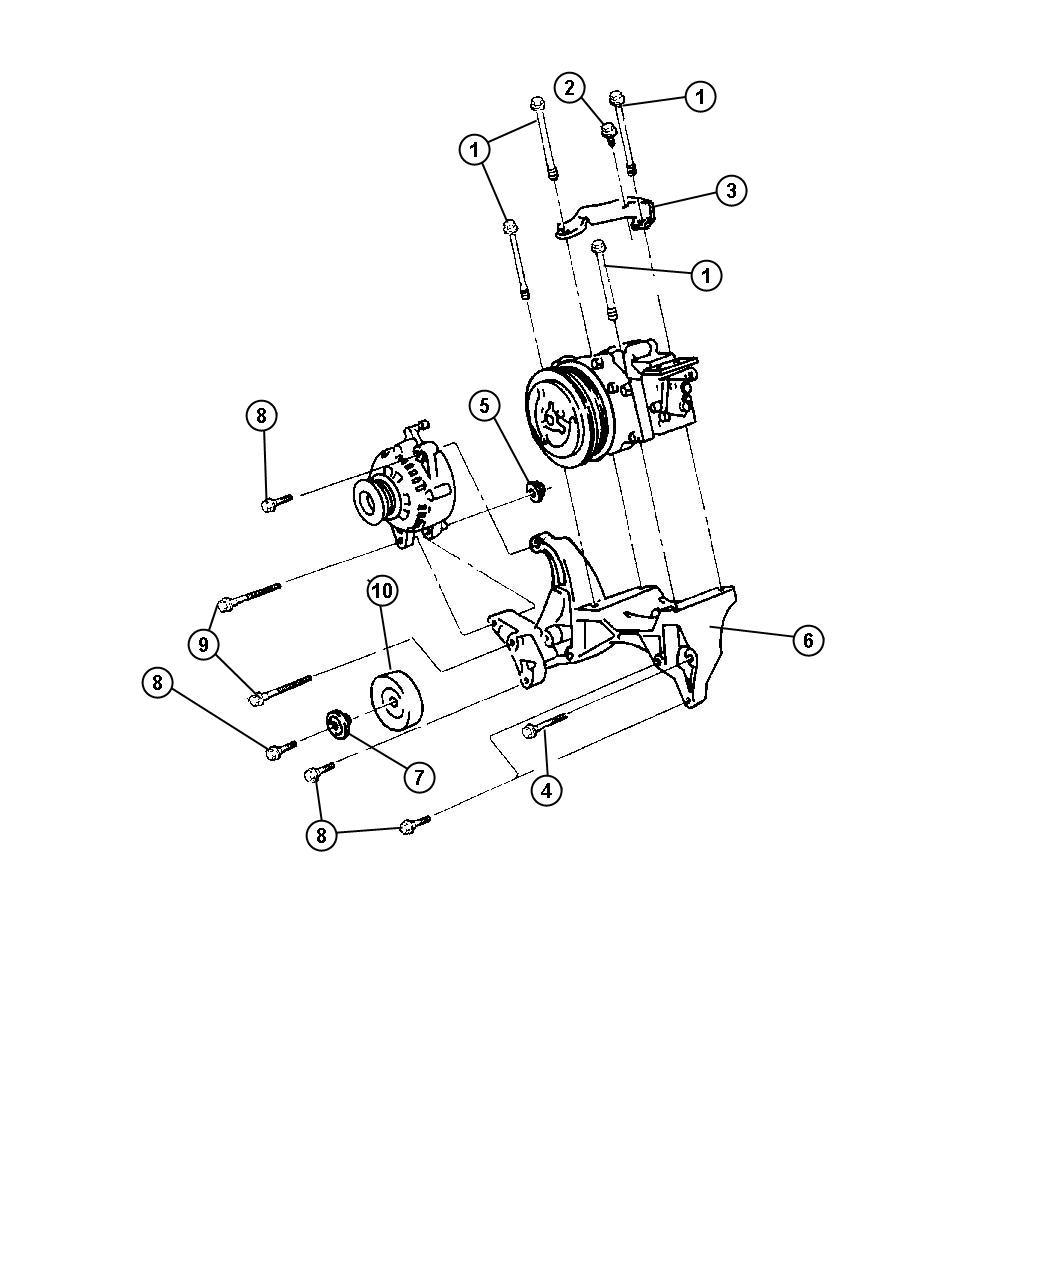 1999 dodge ram 1500 mounting compressor 3 9l 5 2l 5 9l engine